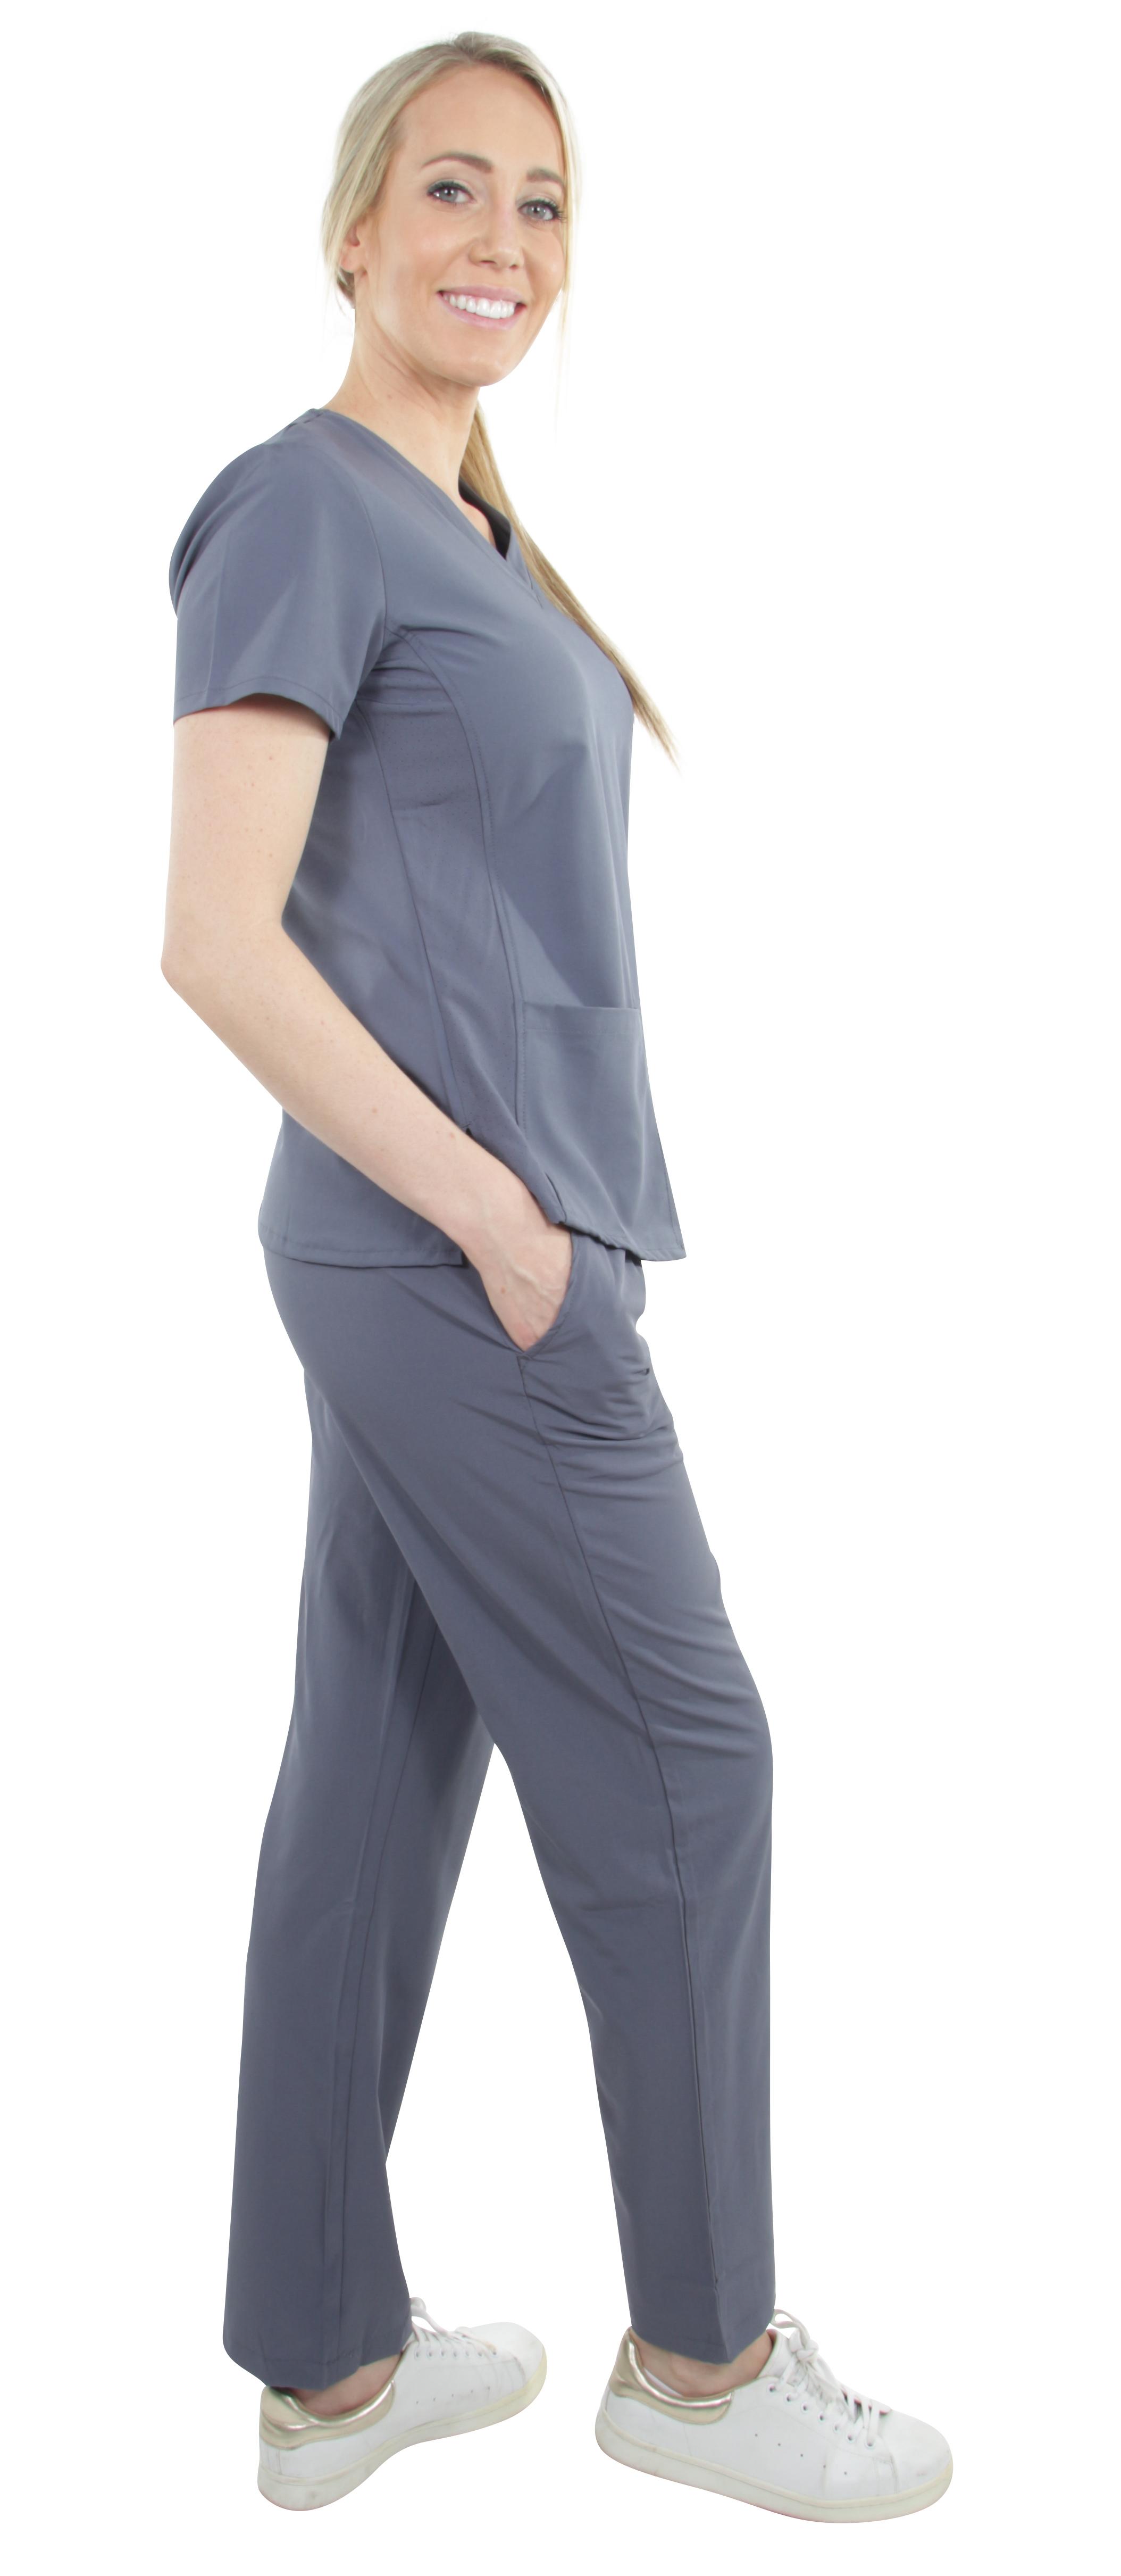 Unisex-Stretch-Medical-Uniform-Five-Pockets-V-Neck-Scrubs-Sets-with-Side-Panels thumbnail 28